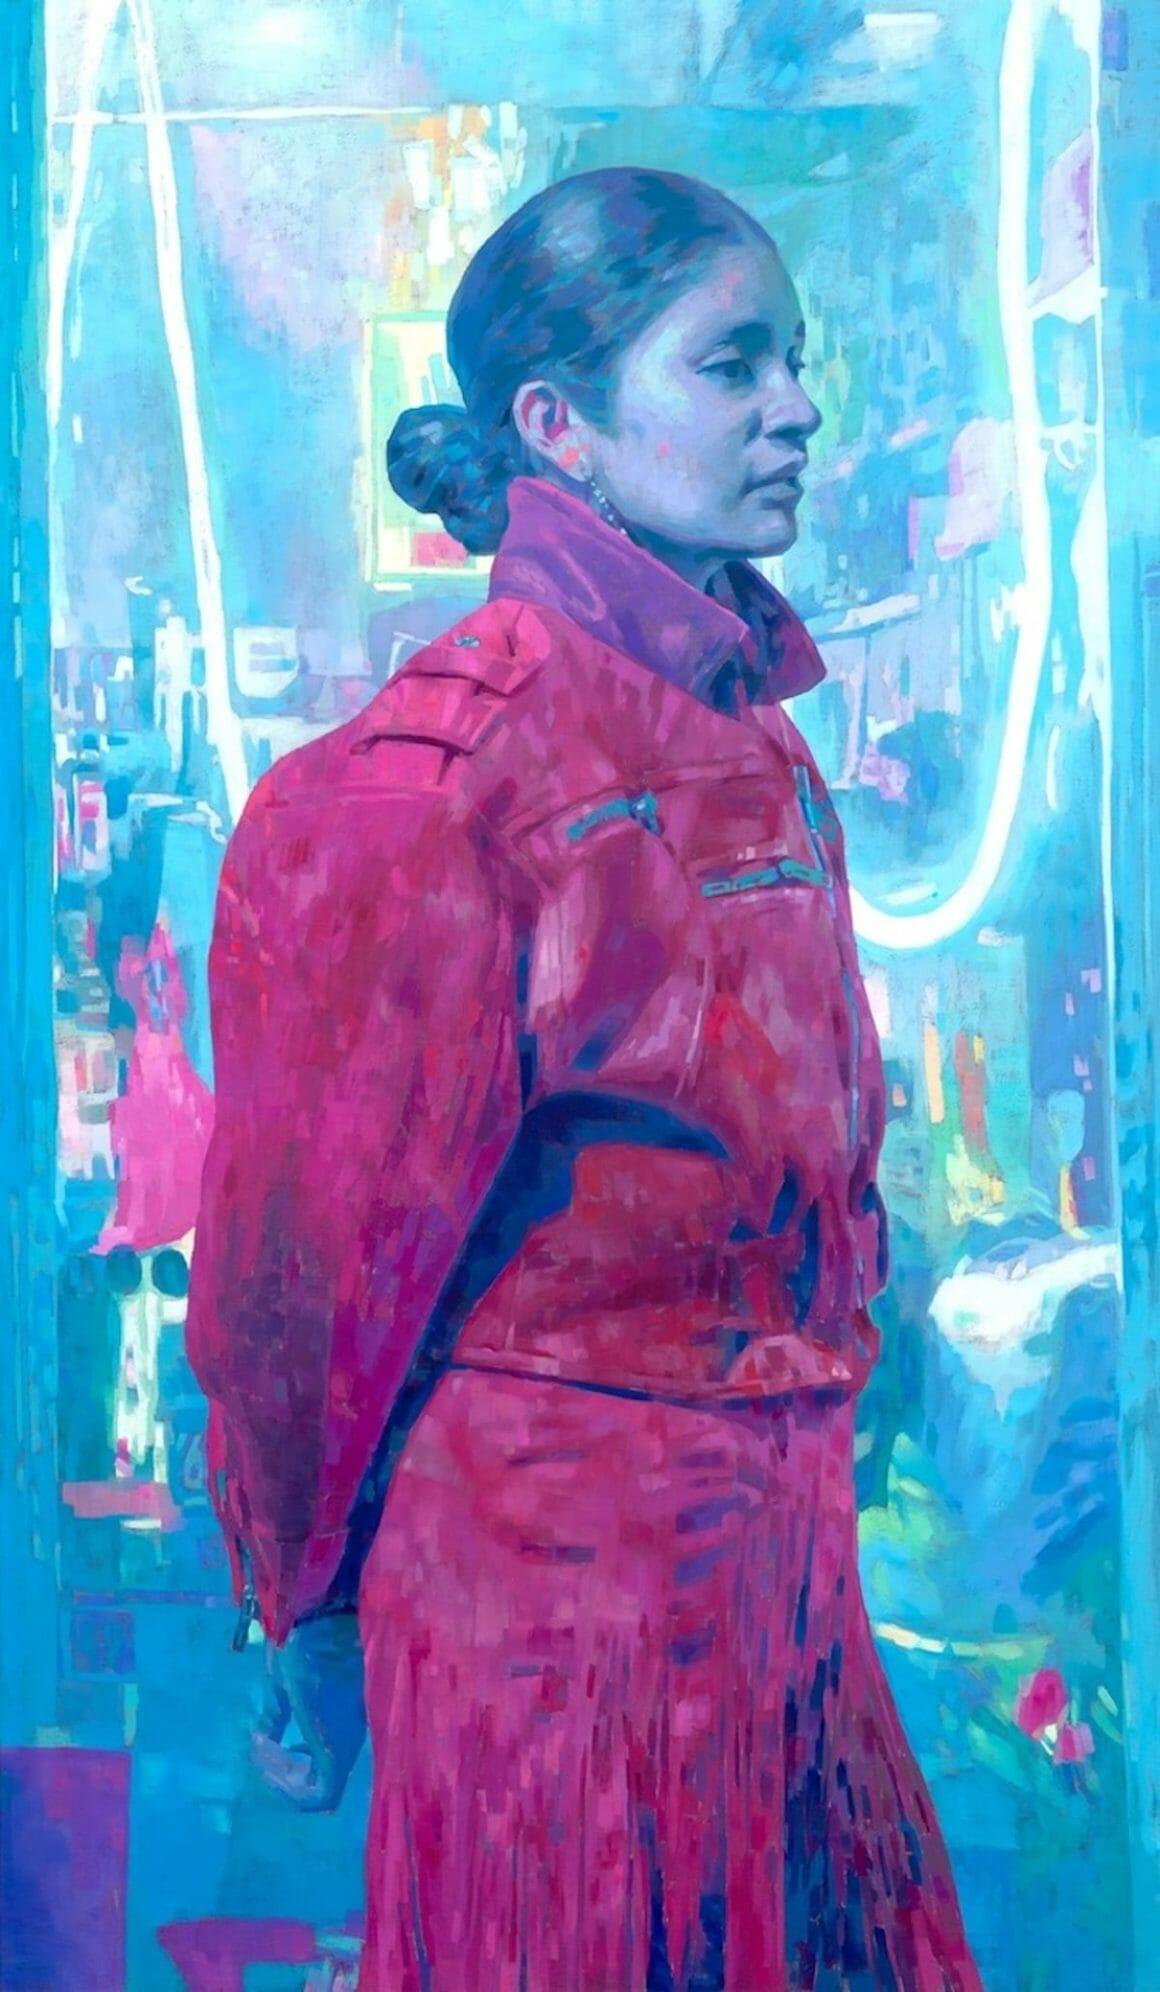 femme peinture Light City